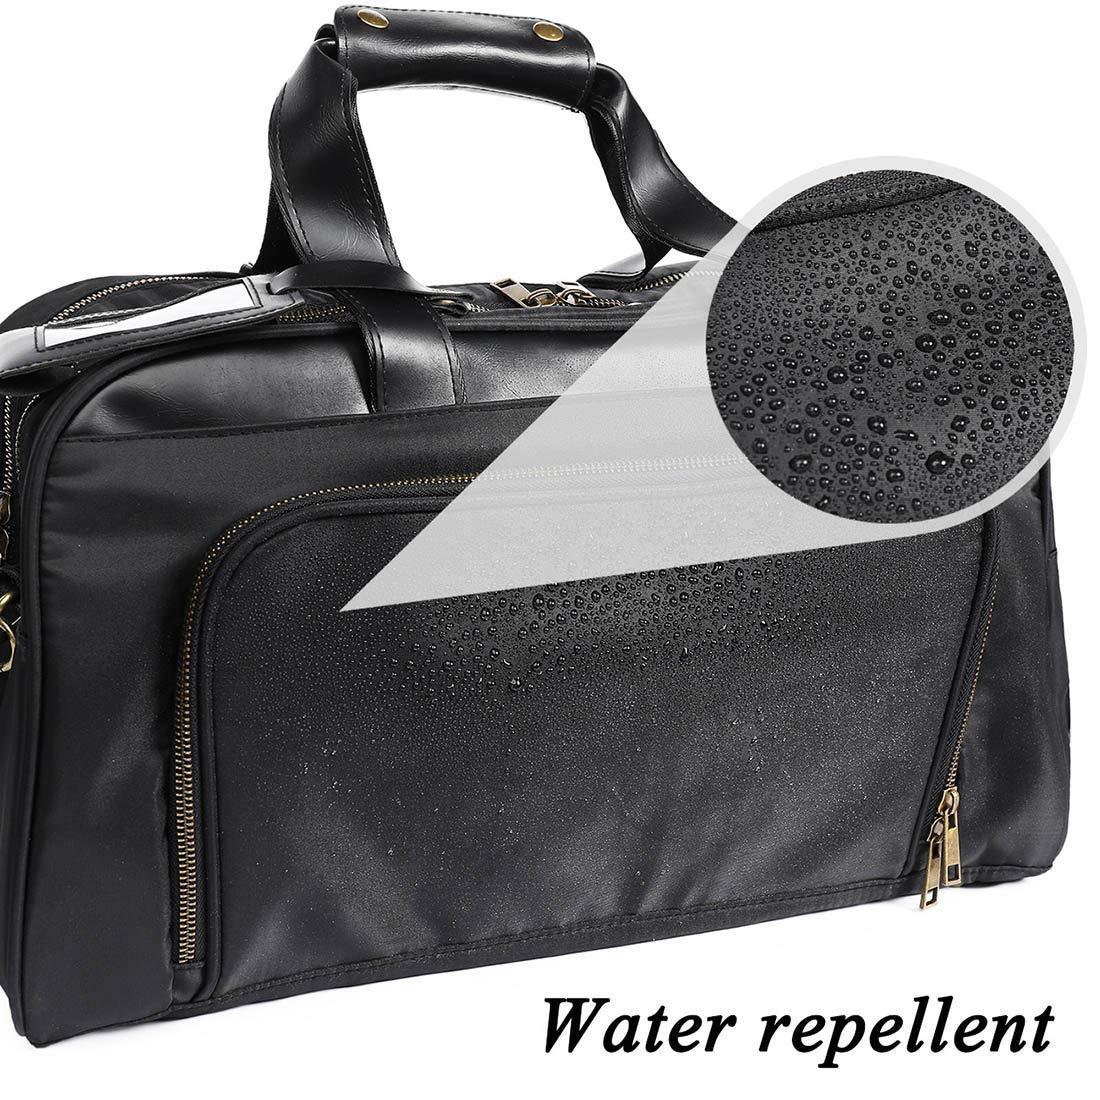 black Business Travel Briefcase Duffel Bags for Men Laptop Bag fits 15inches Laptop 22L